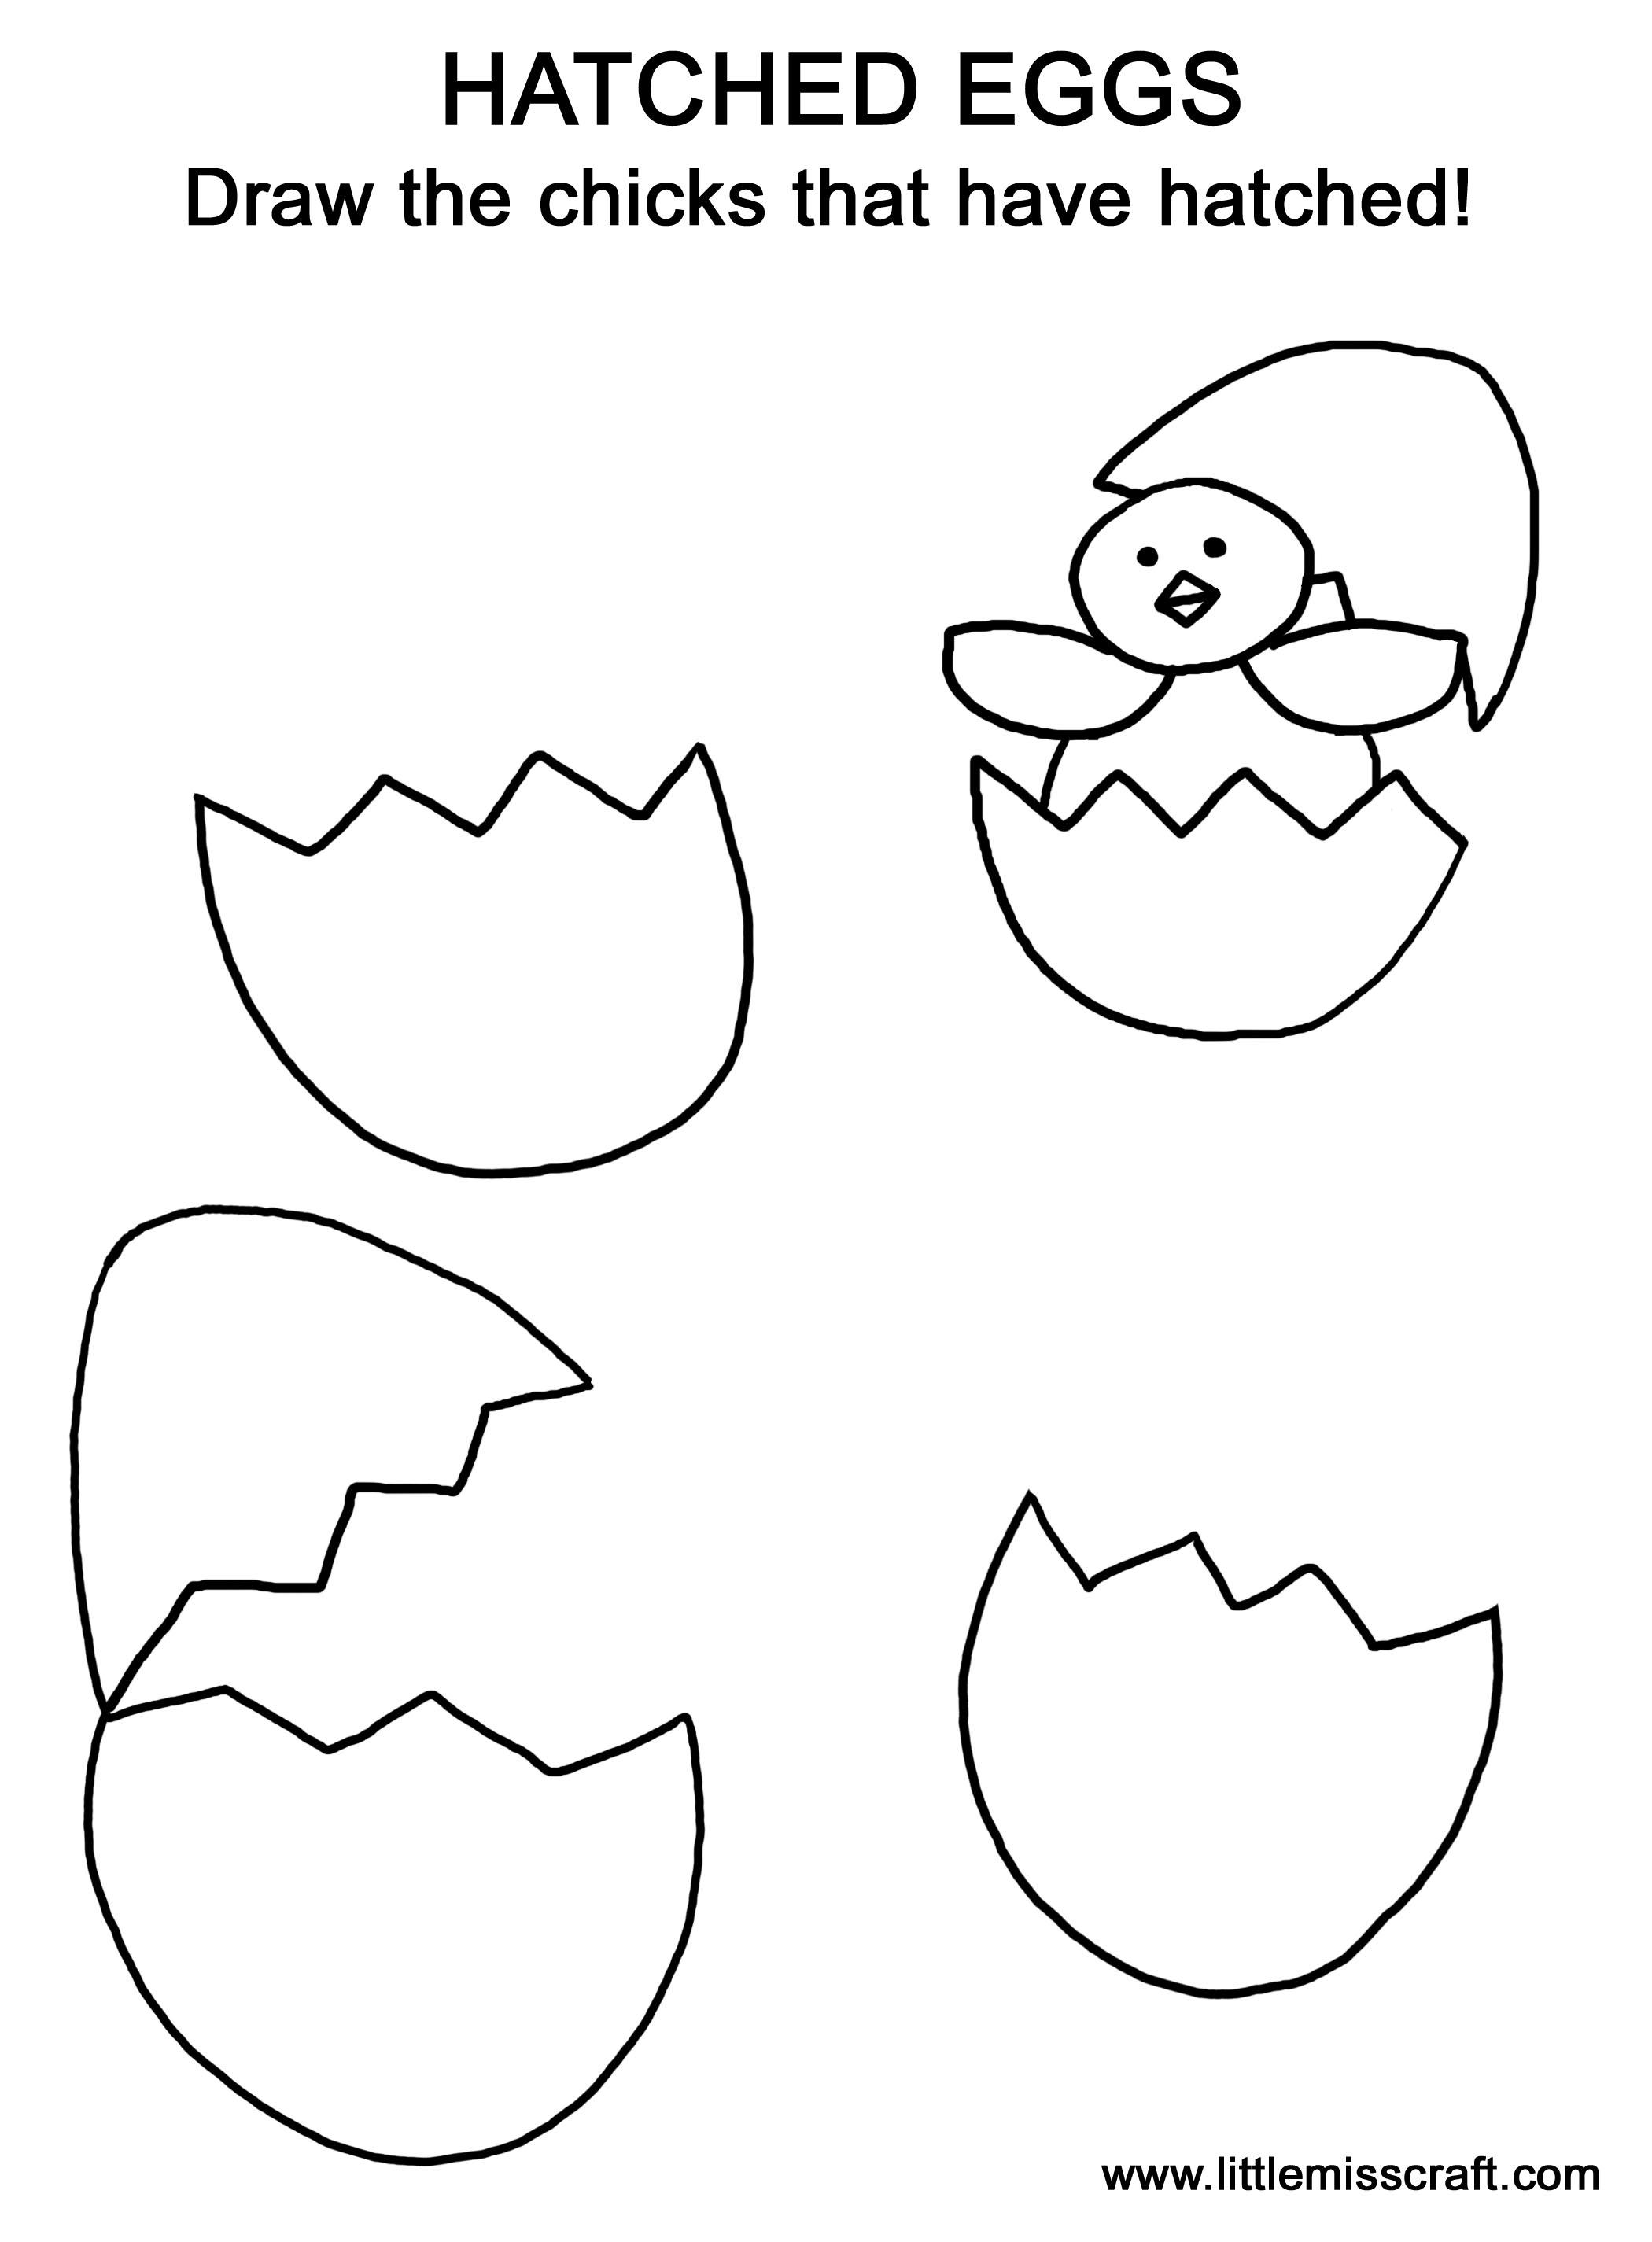 Egg Line Drawing at GetDrawings